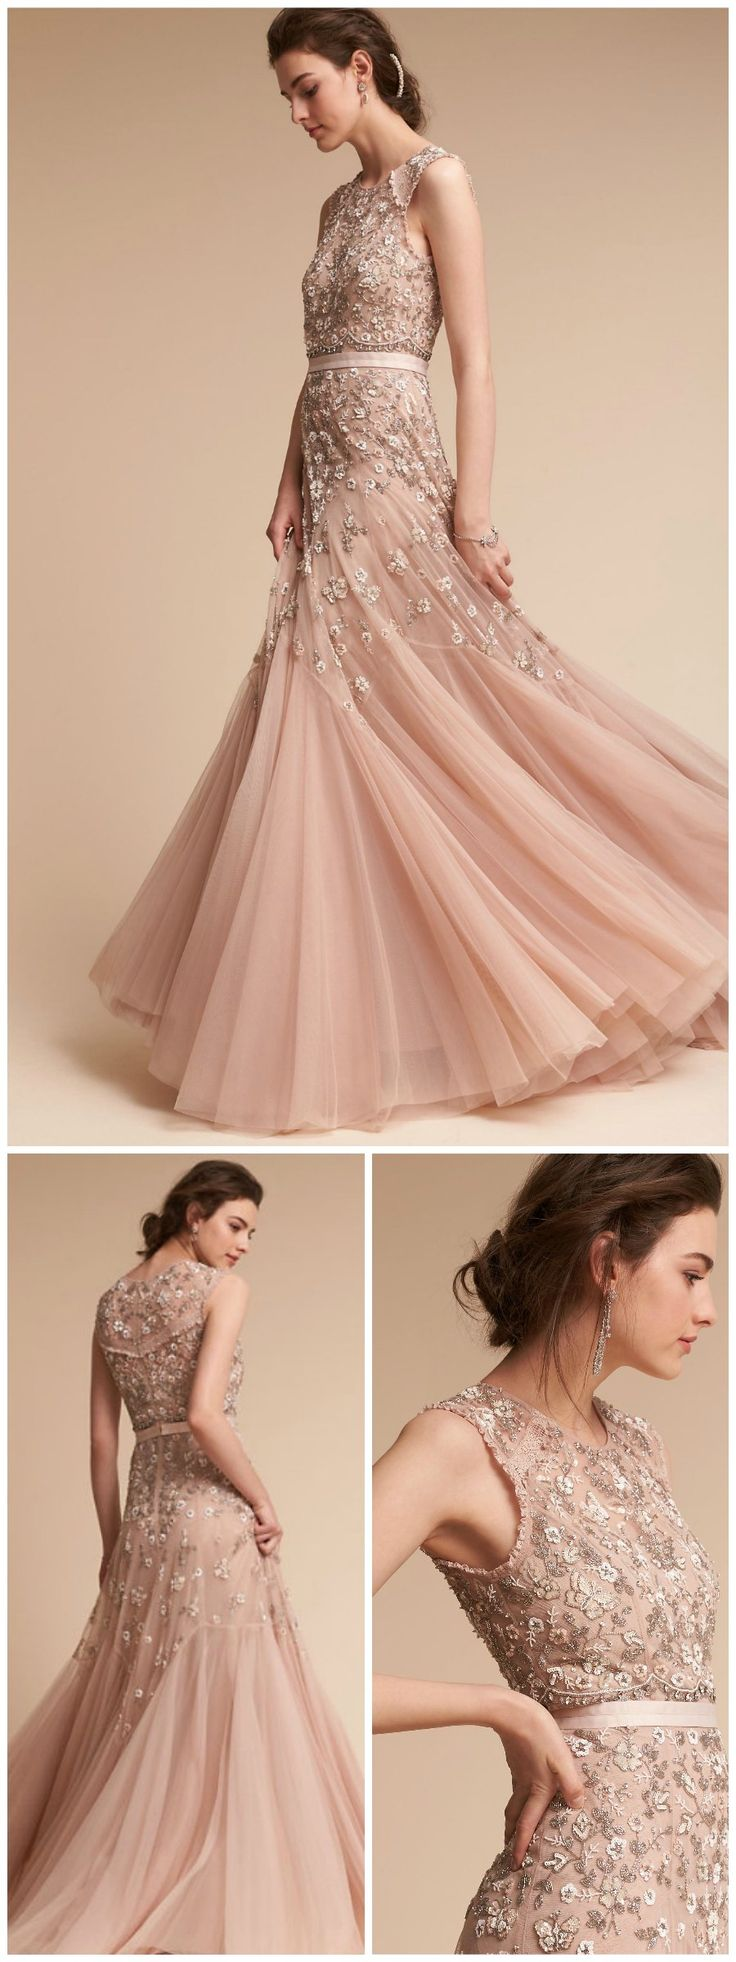 Blush Floral Wedding Dress